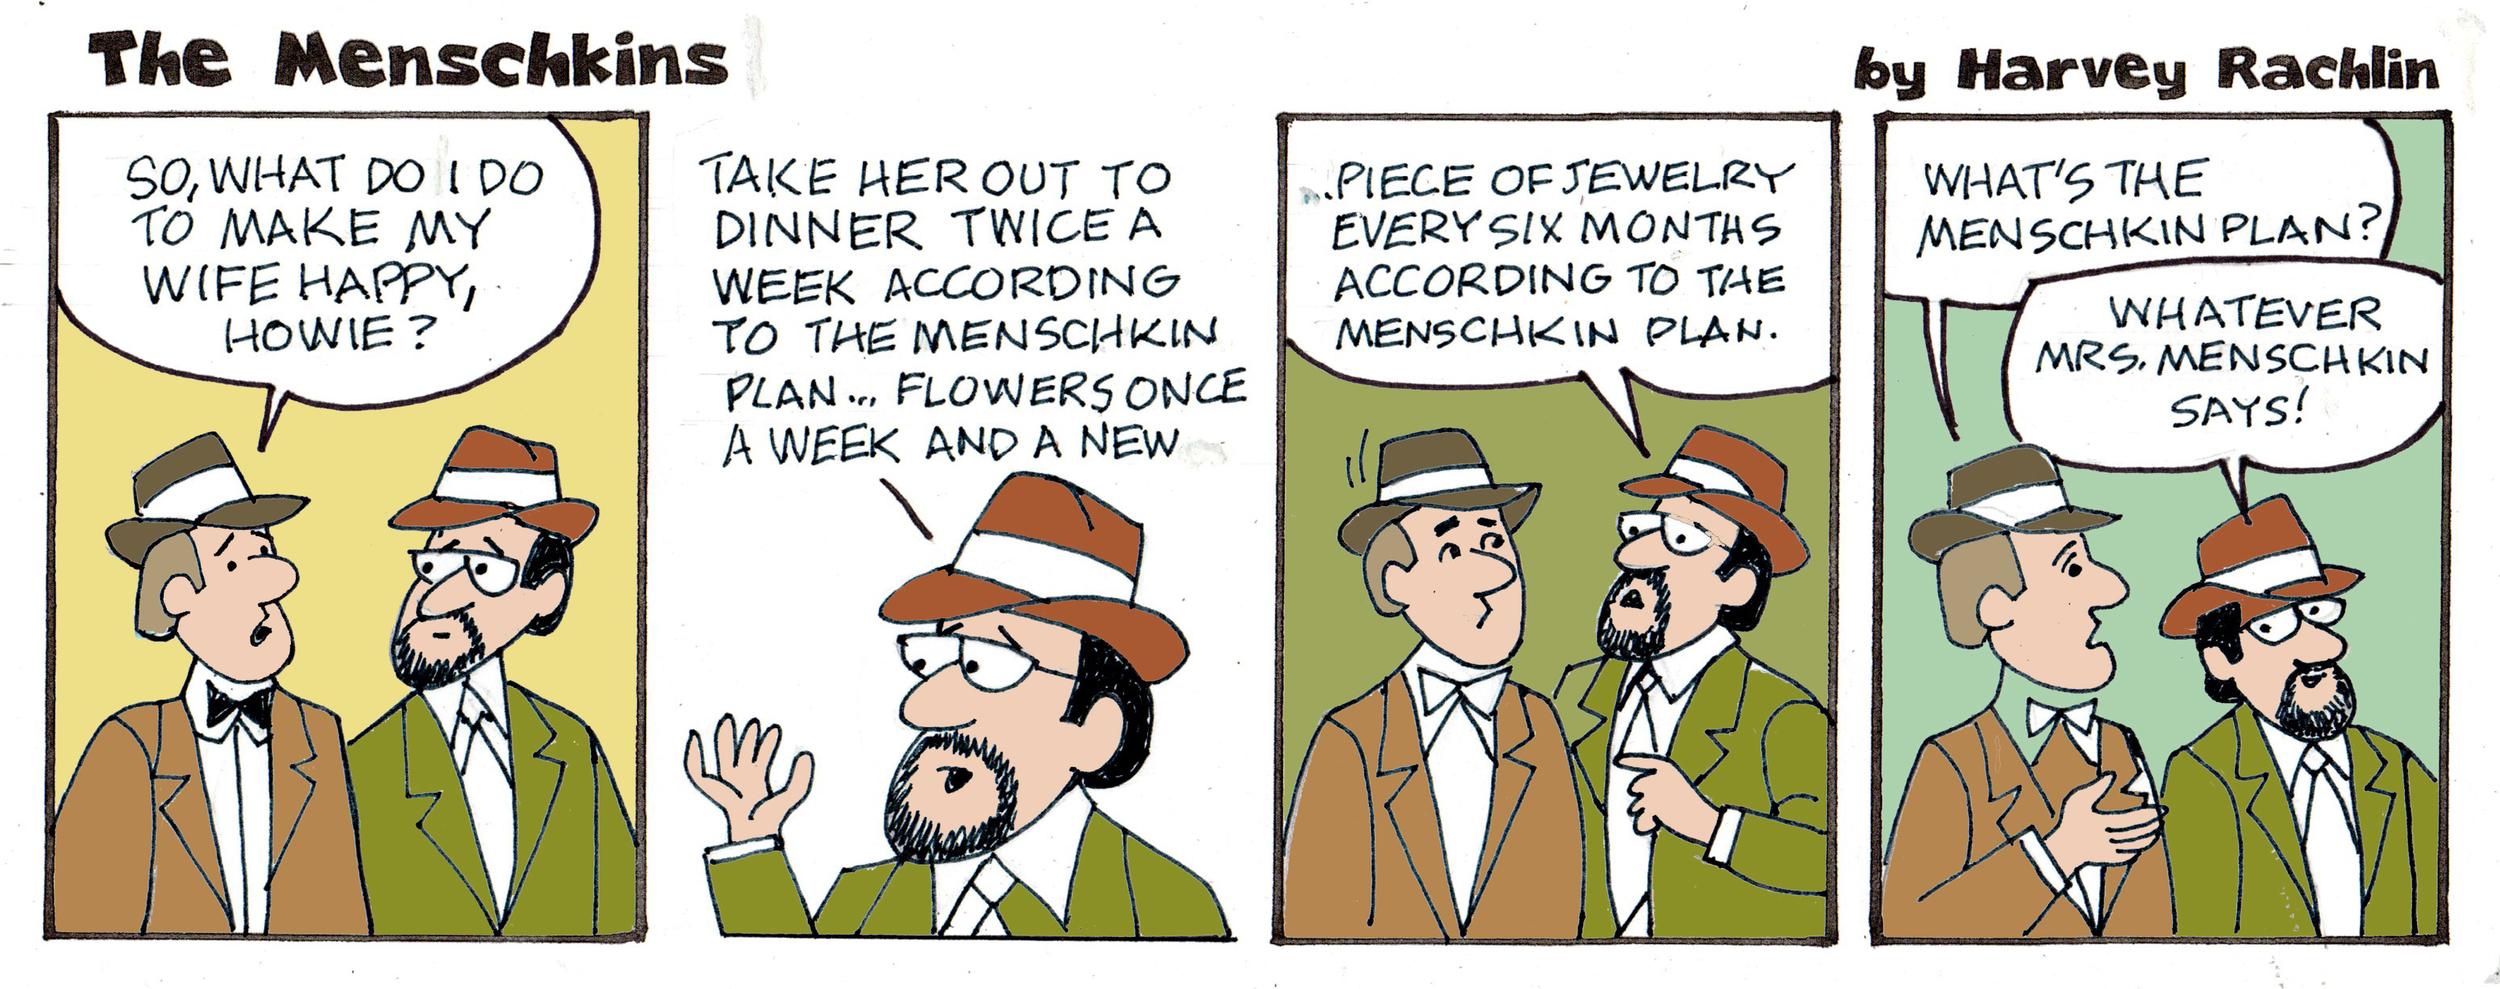 The Menschkin Plan